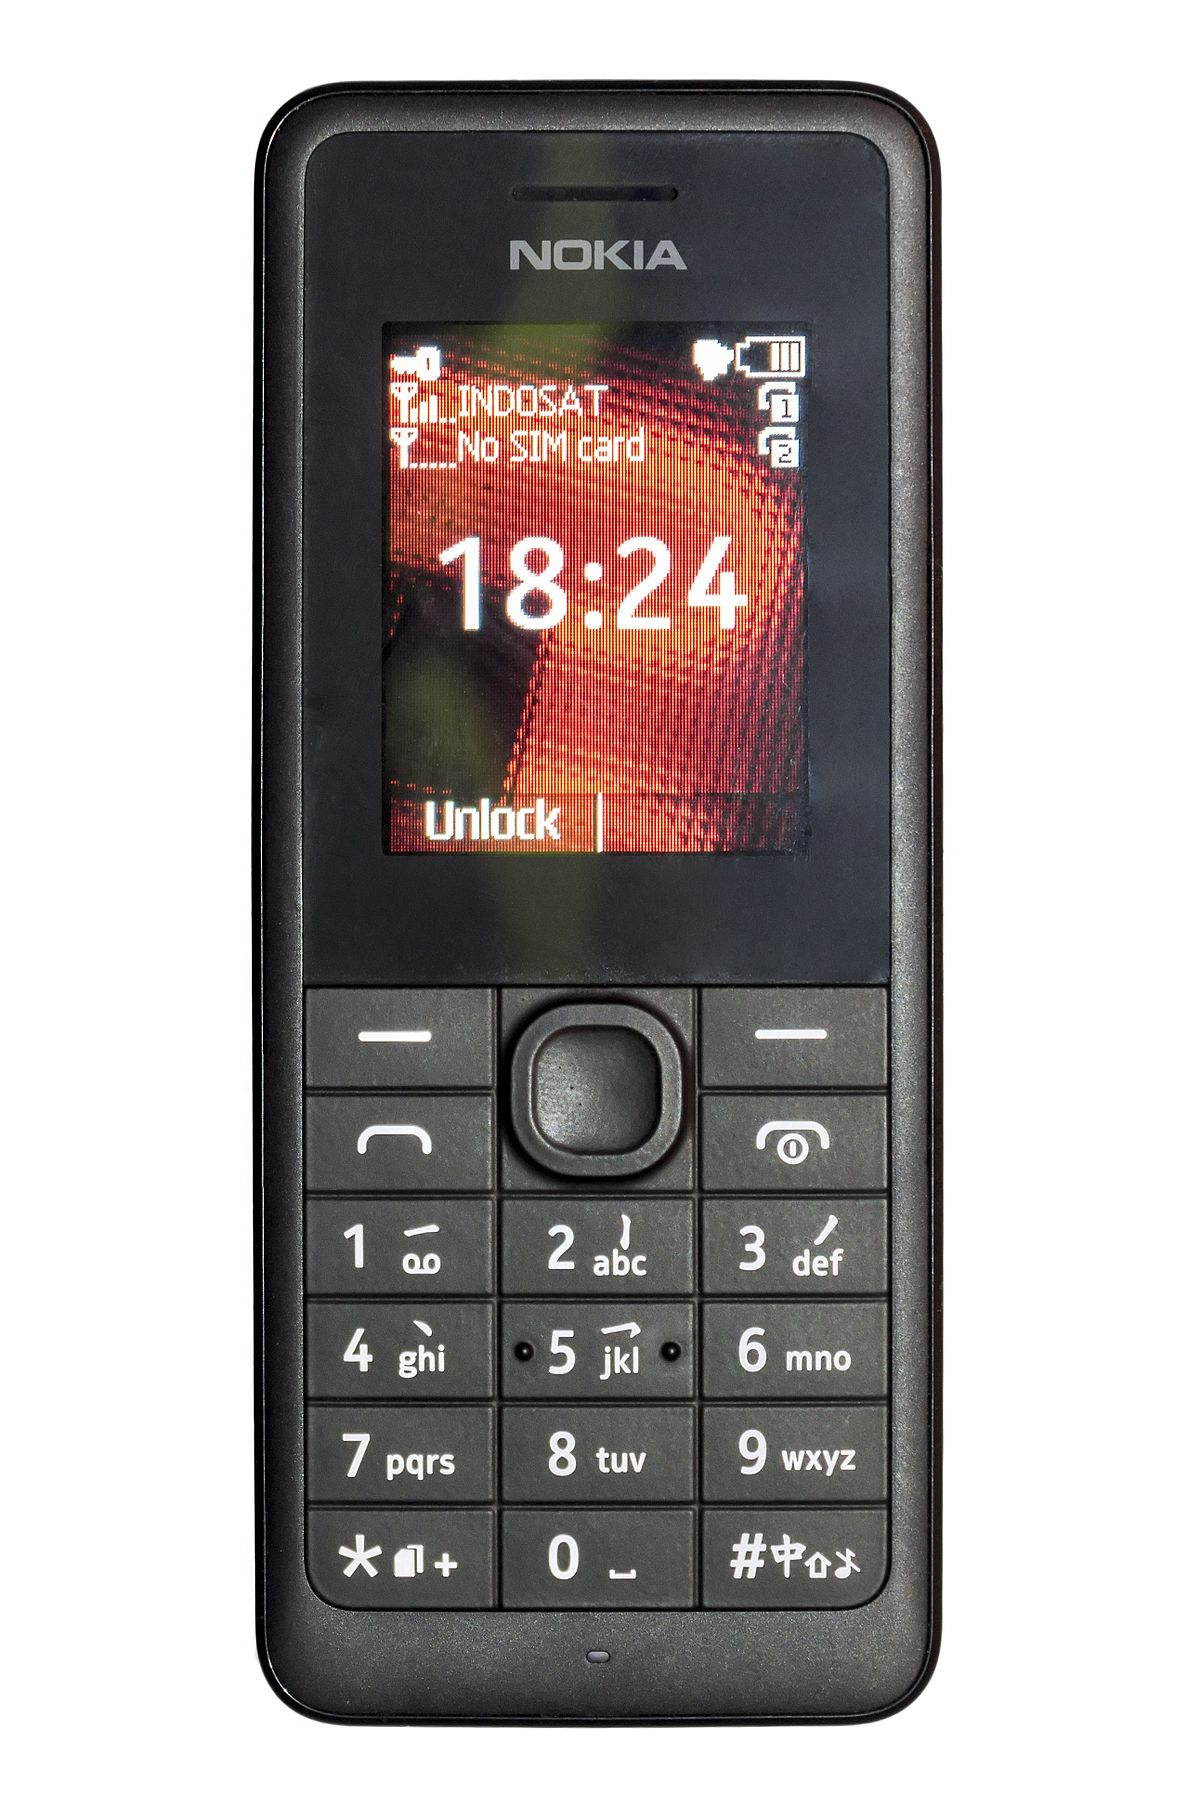 Px Nokia Dual Sim Card on Usb To Microsd Card